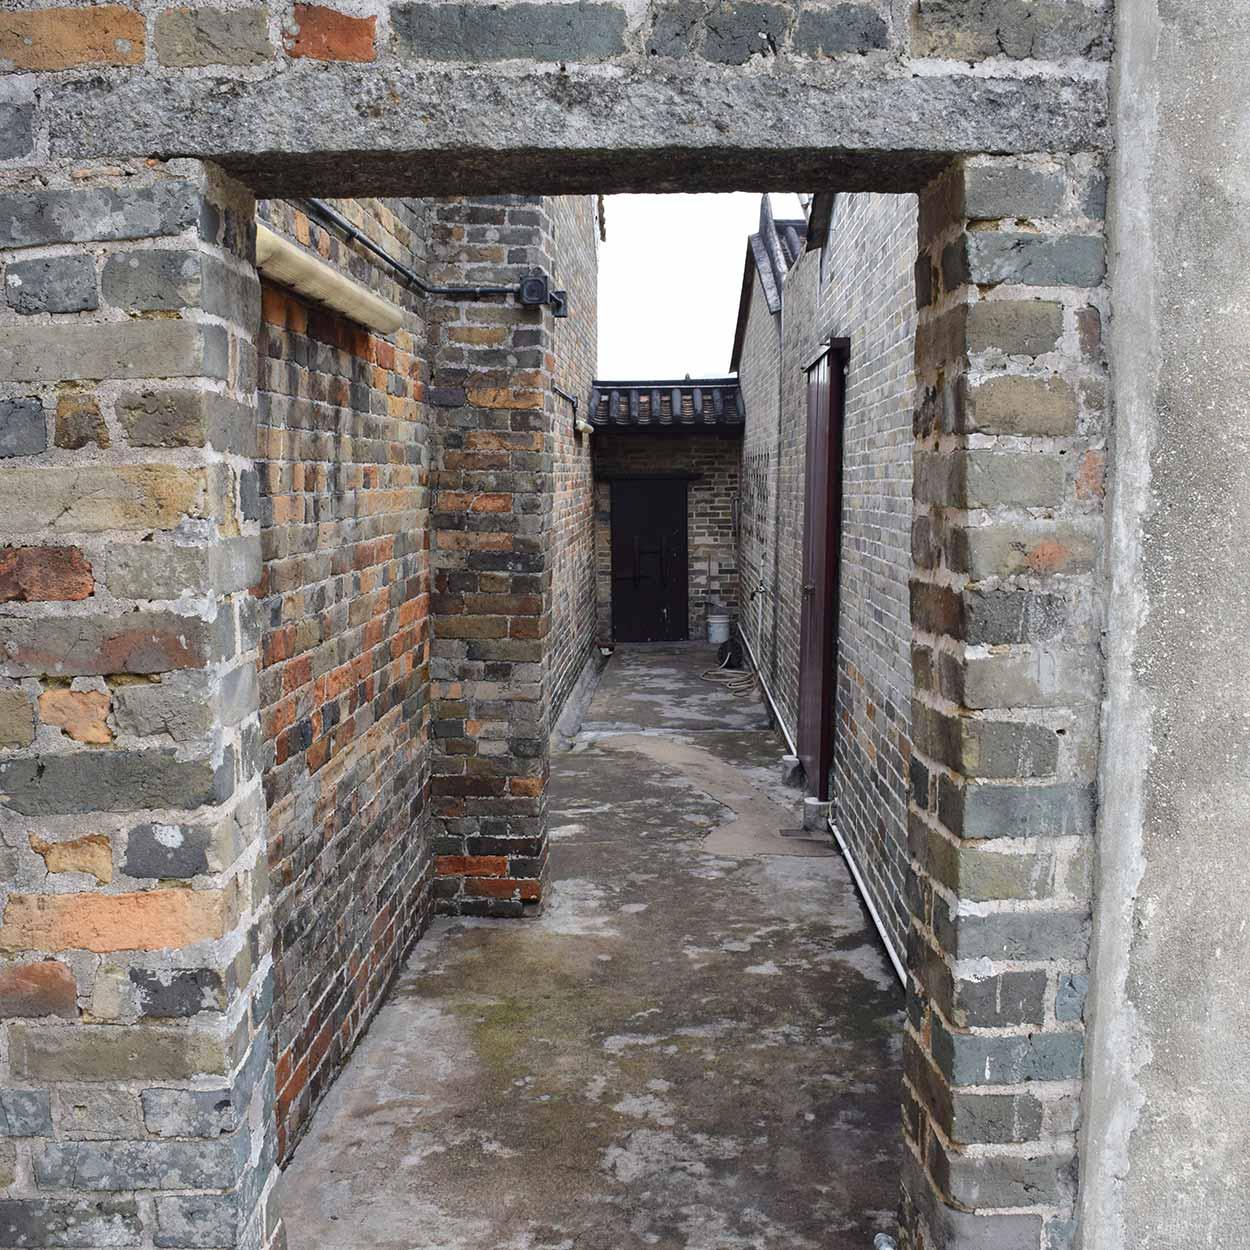 Brickwork of the Tung Chung Ling Ancestral Hall, Lung Yeuk Tau Heritage Trail, Hong Kong, China